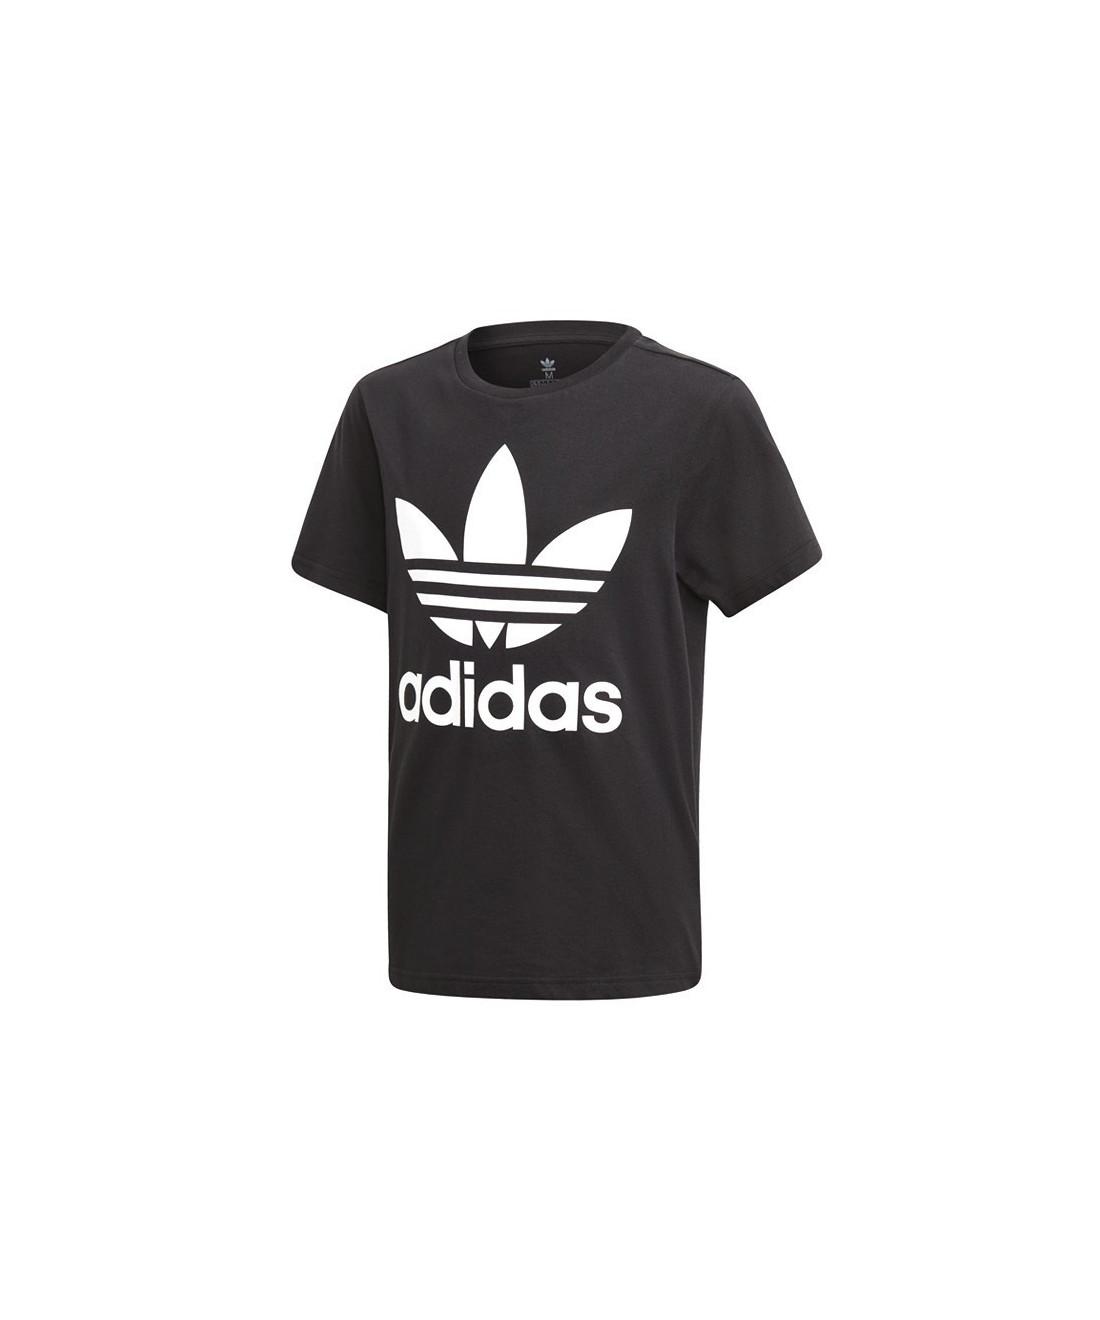 Adidas T-shirt Noir DV2905